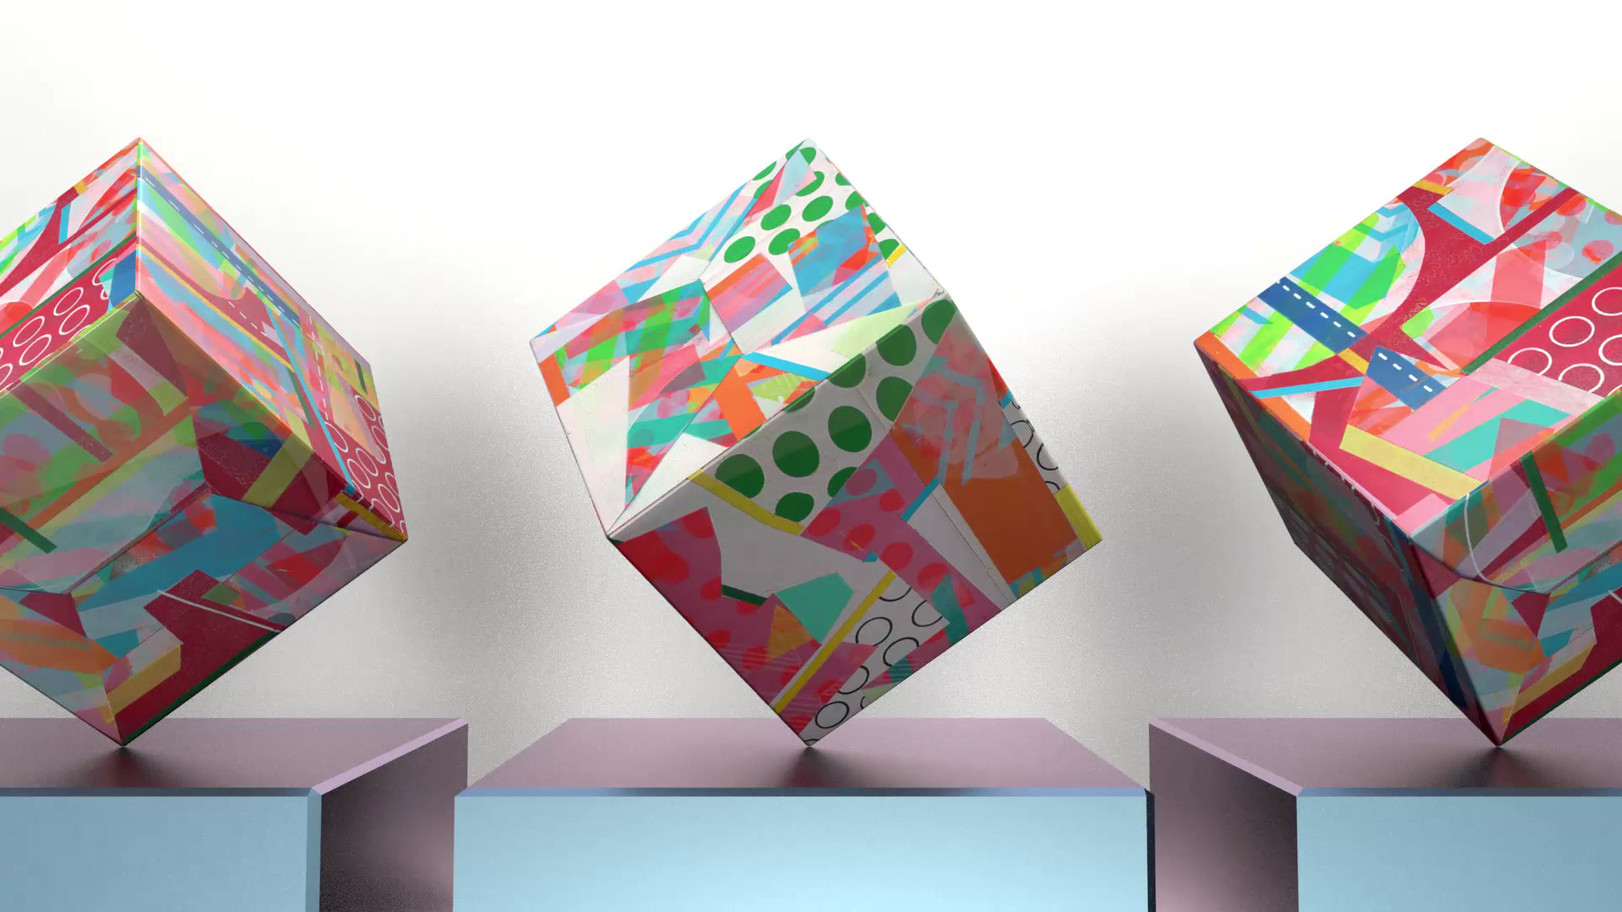 Cubes_factory_1.mp4